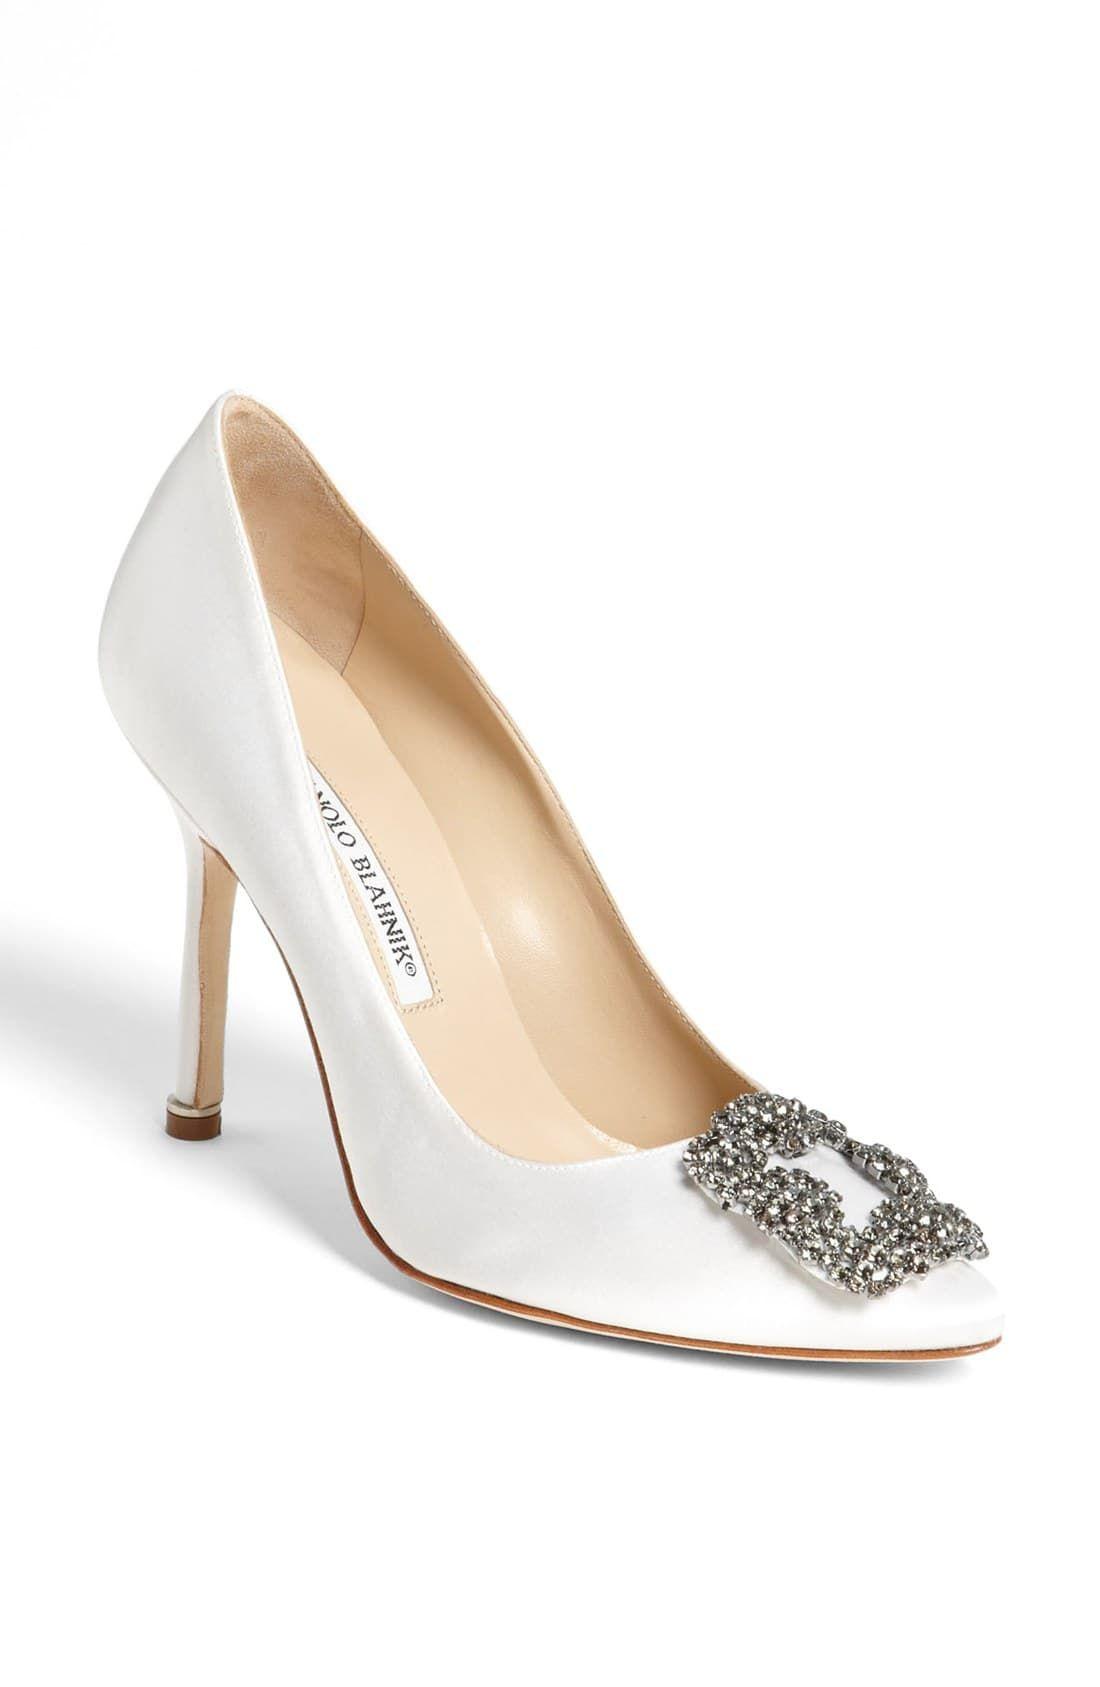 Manolo Blahnik Hangisi Pointed Toe Pump Women Nordstrom Manolo Blahnik Hangisi Manolo Blahnik Wedding Shoes Manolo Blahnik